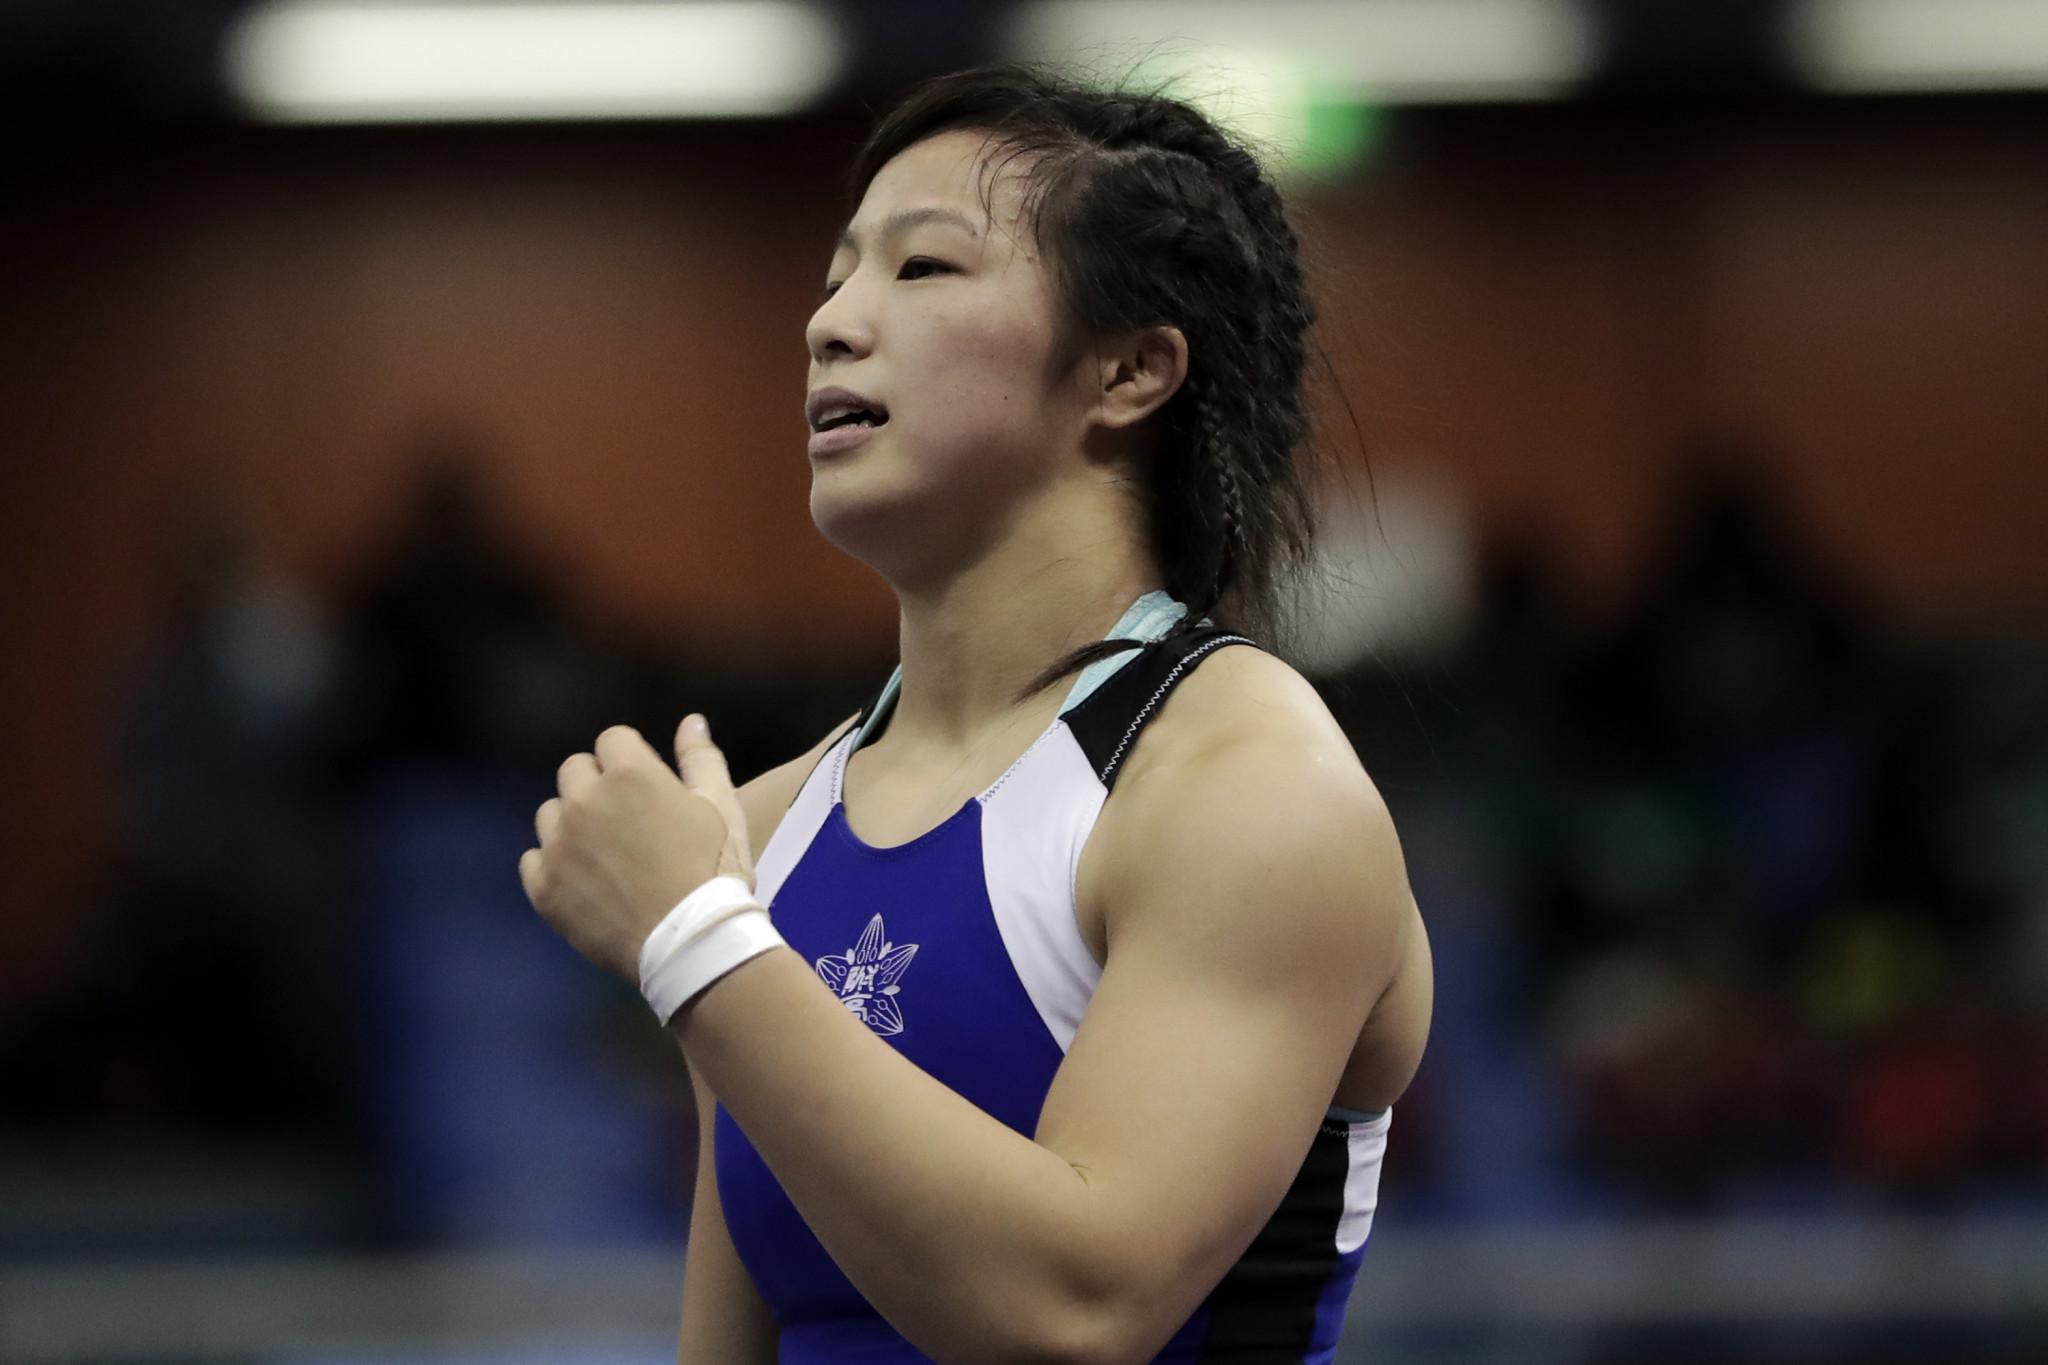 Kazakhstan and Japan share final women's titles at Asian Wrestling Championships